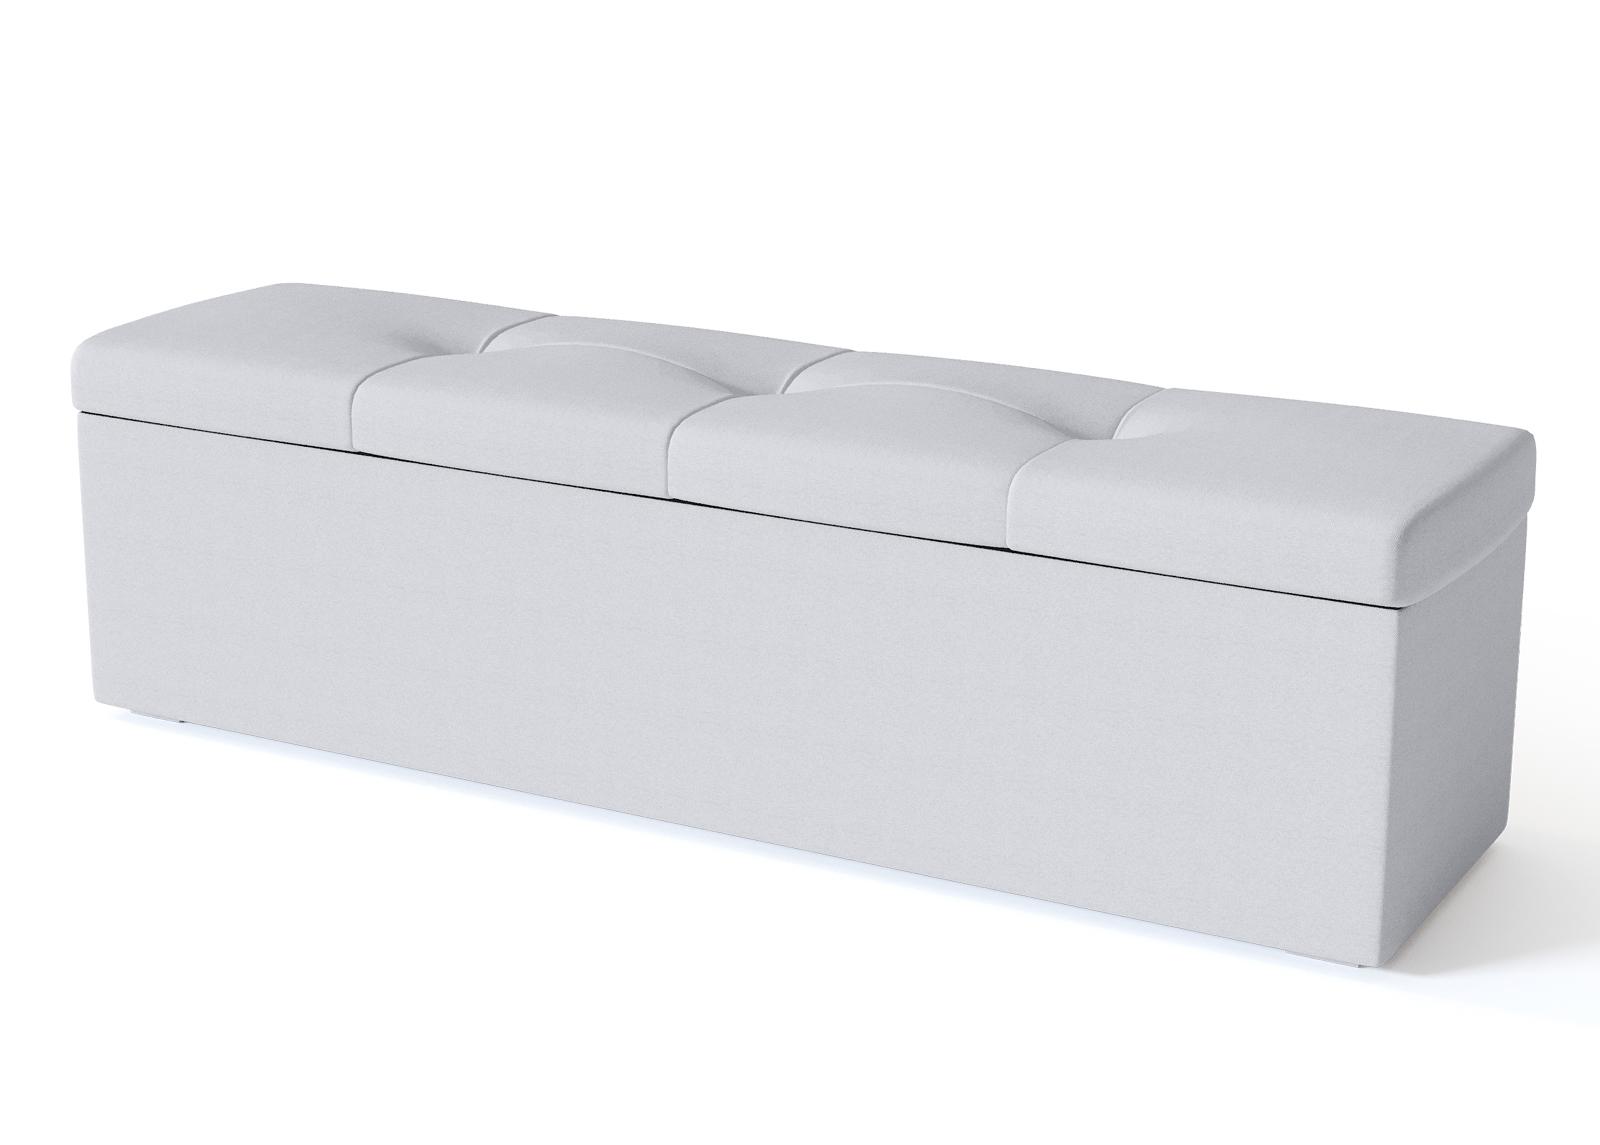 Sleepwell vuodevaatelaatikko BLACK Ulvasen 120 cm